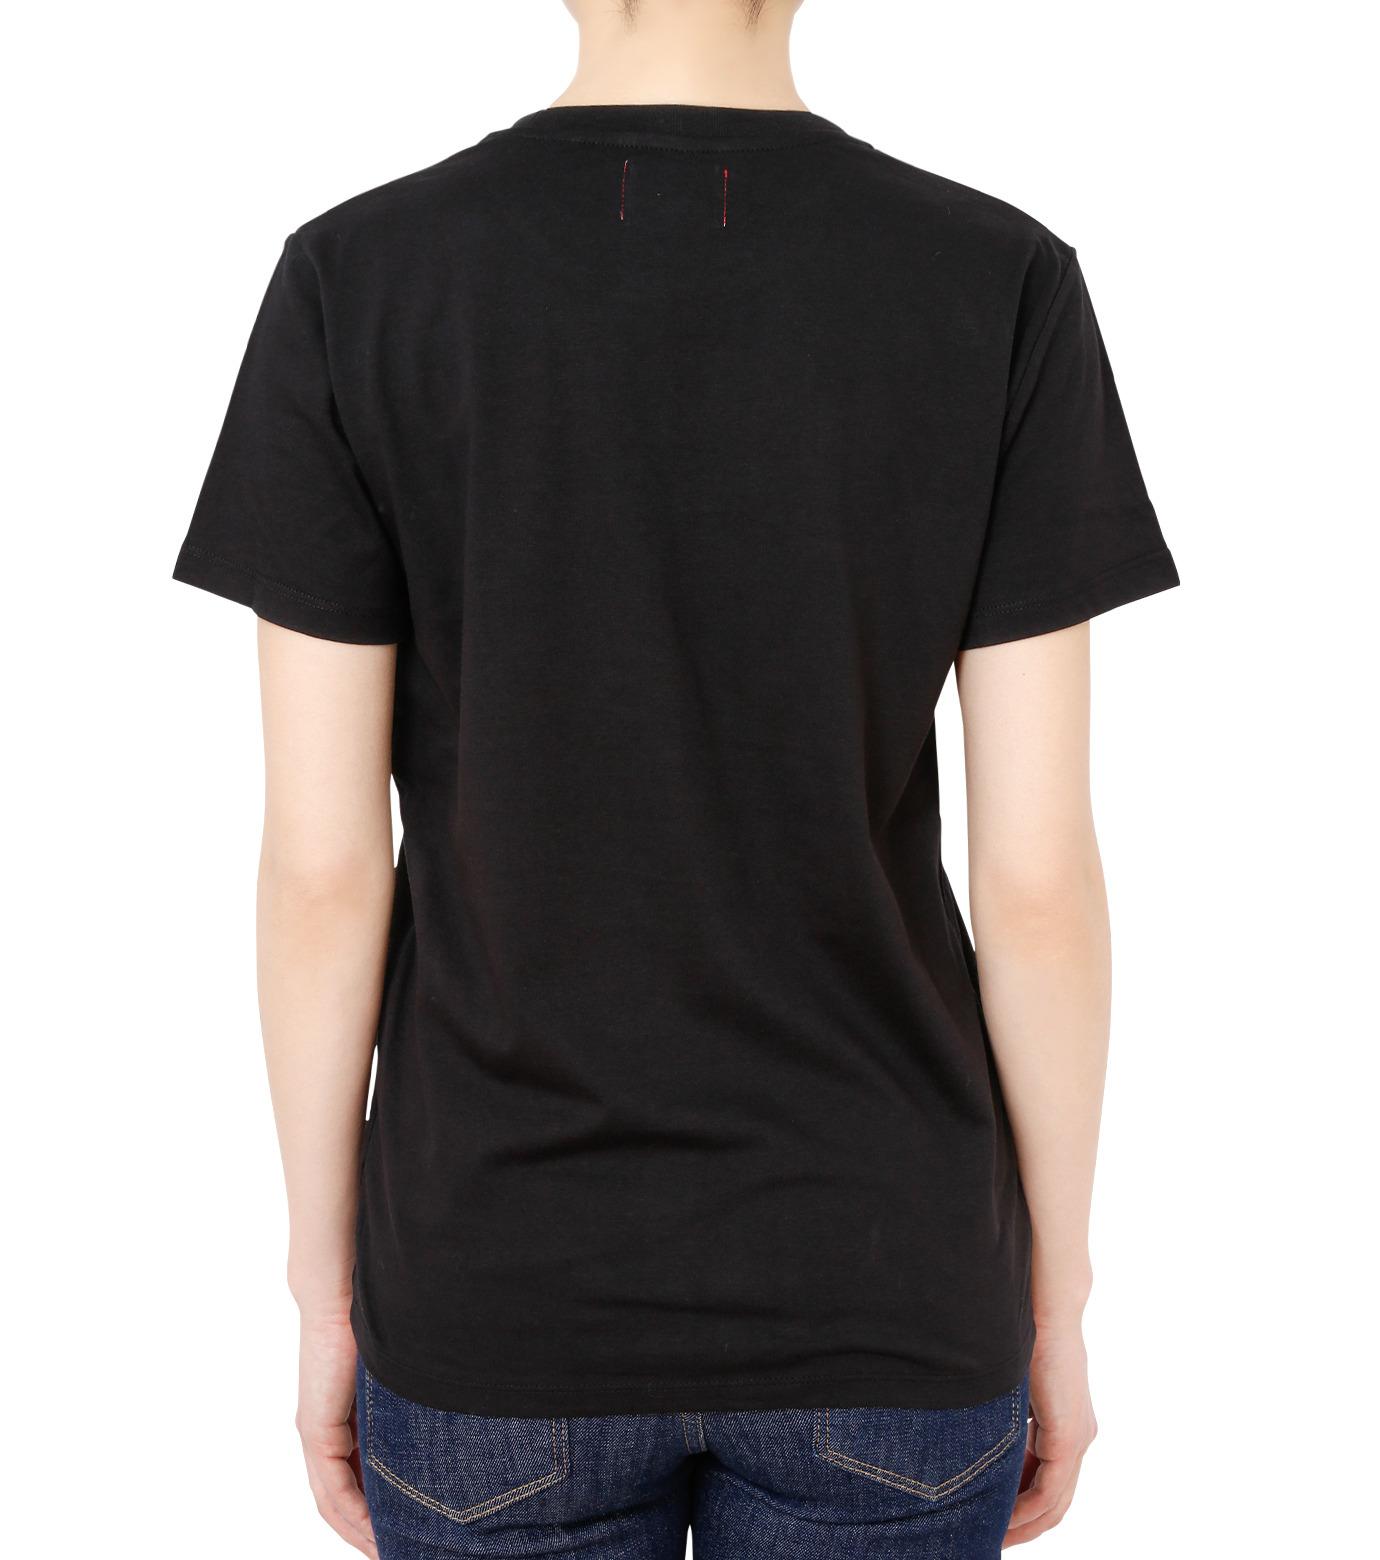 No One(ノーワン)のPanama T-shirt-BLACK(カットソー/cut and sewn)-BA545-13 拡大詳細画像2